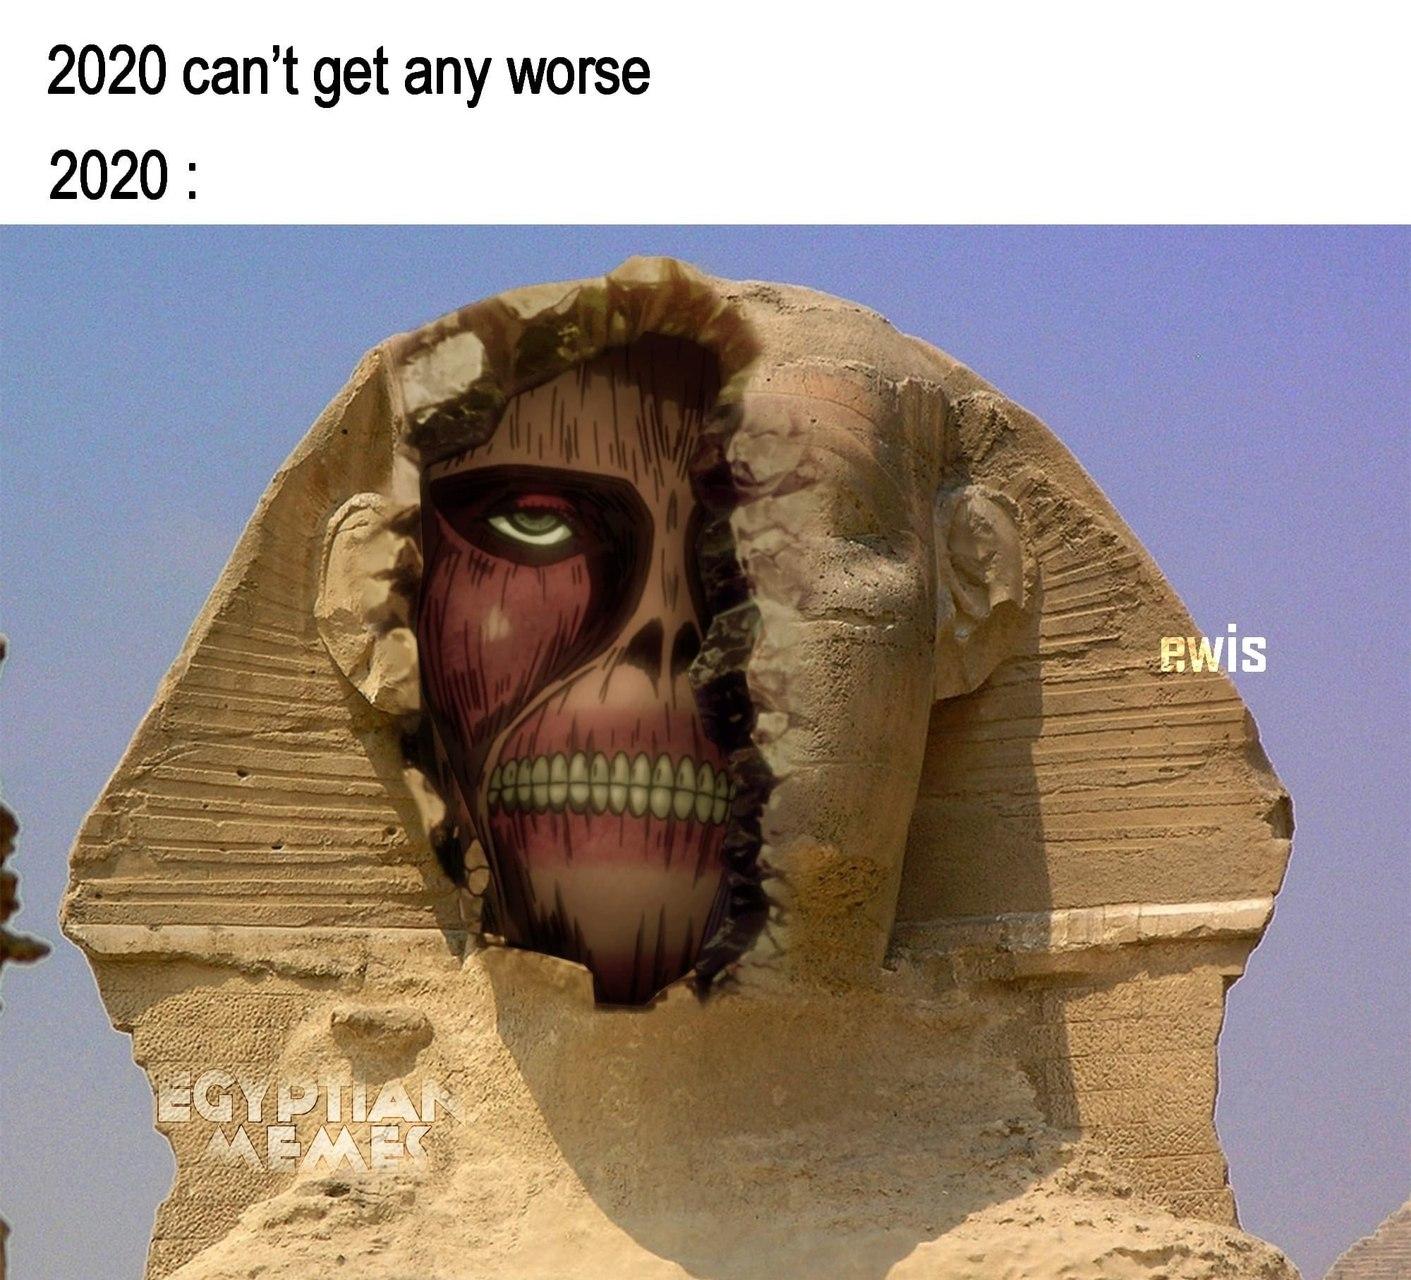 Ewis - meme